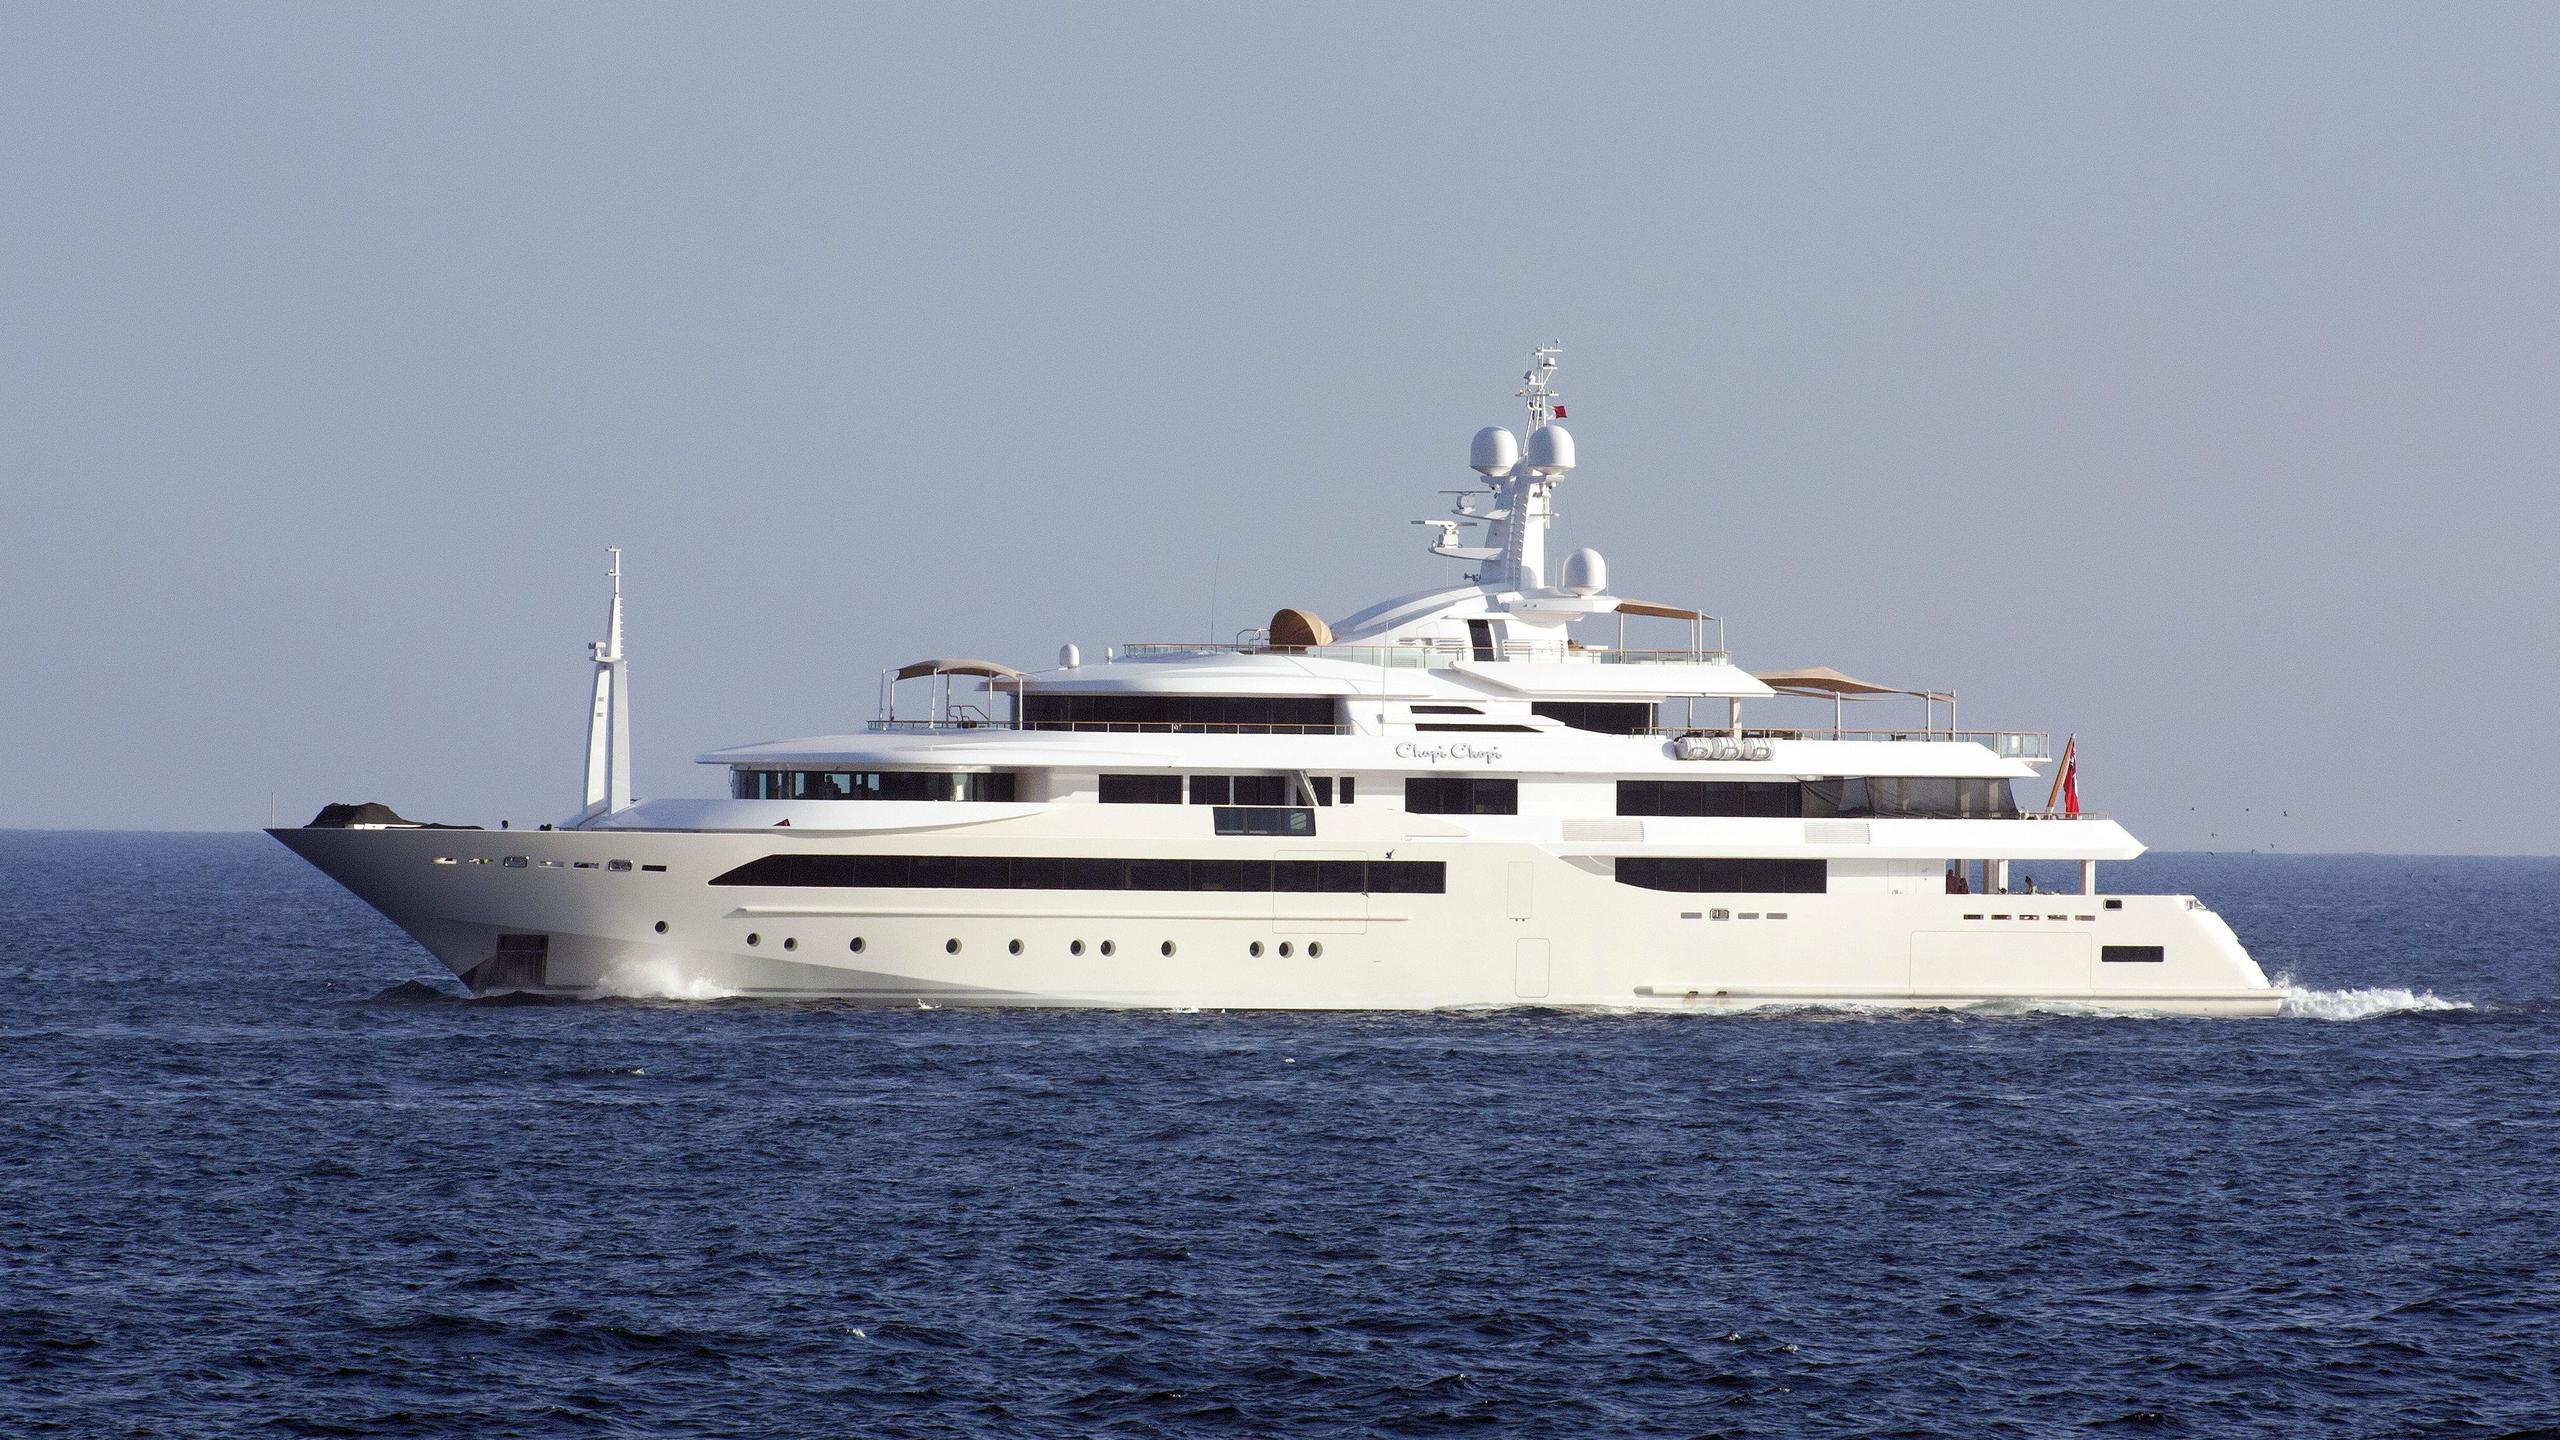 chopi-chopi-motor-yacht-crn-2013-80m-profile-distance